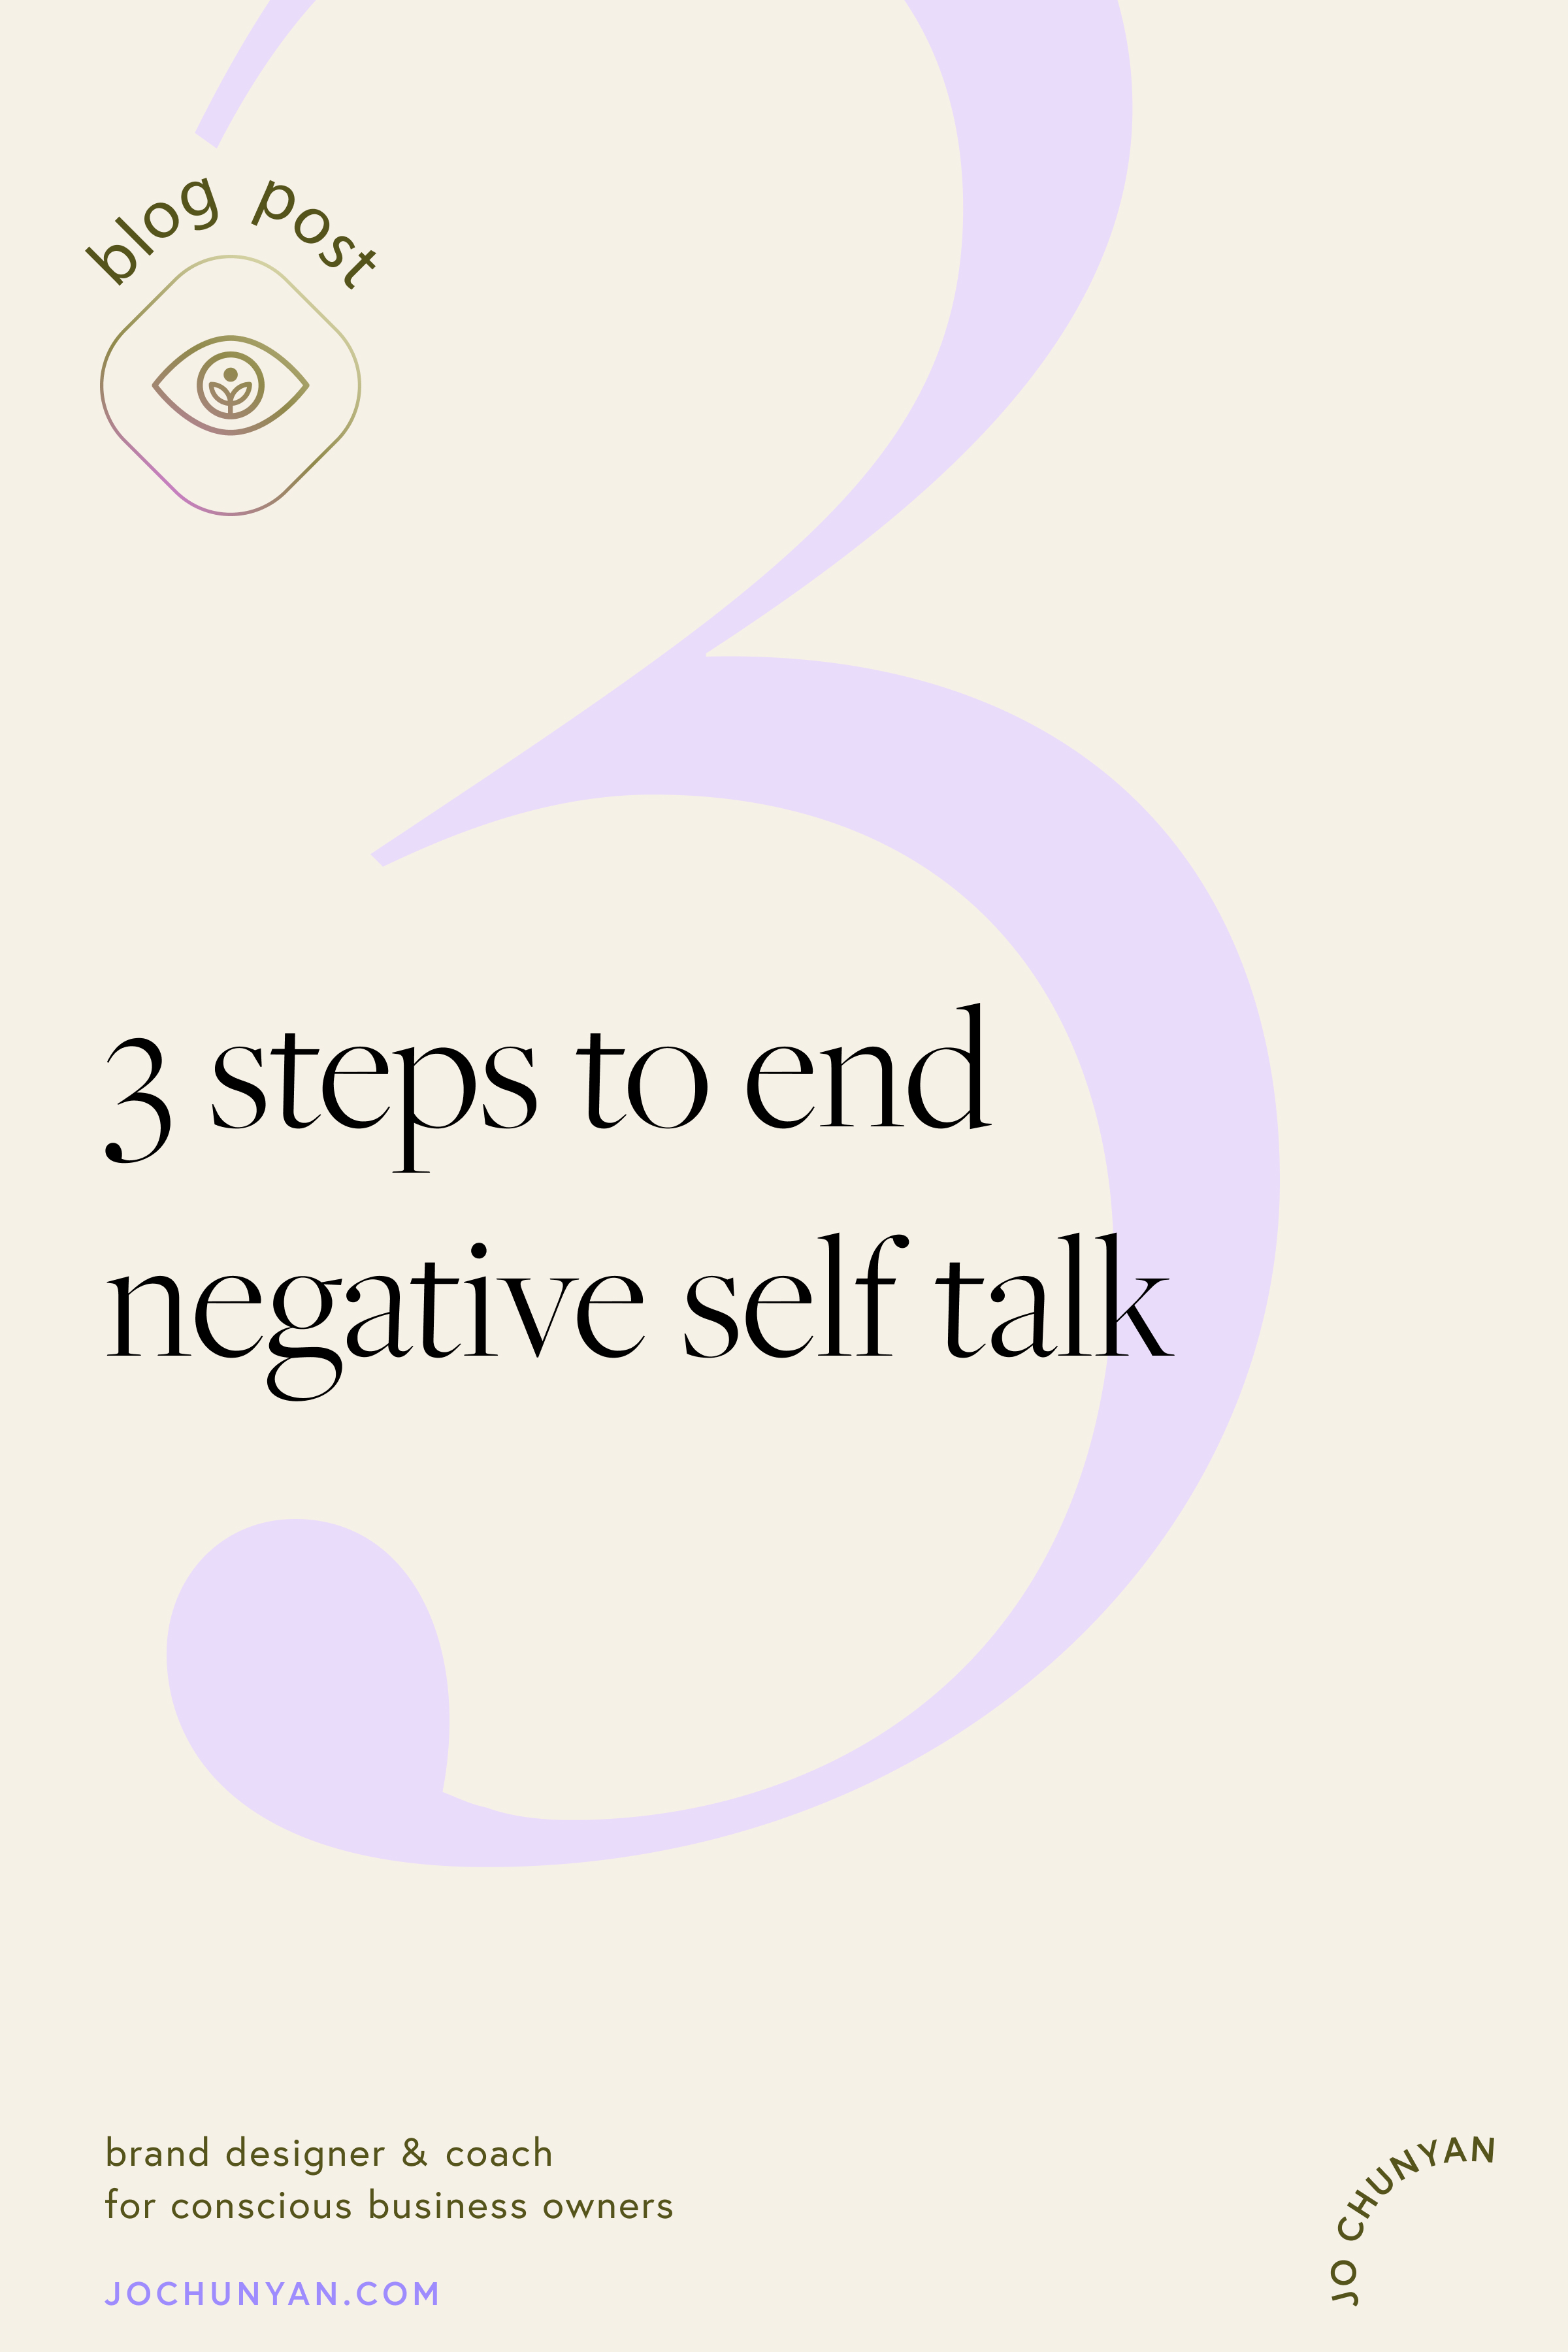 3 steps to end negative self talk